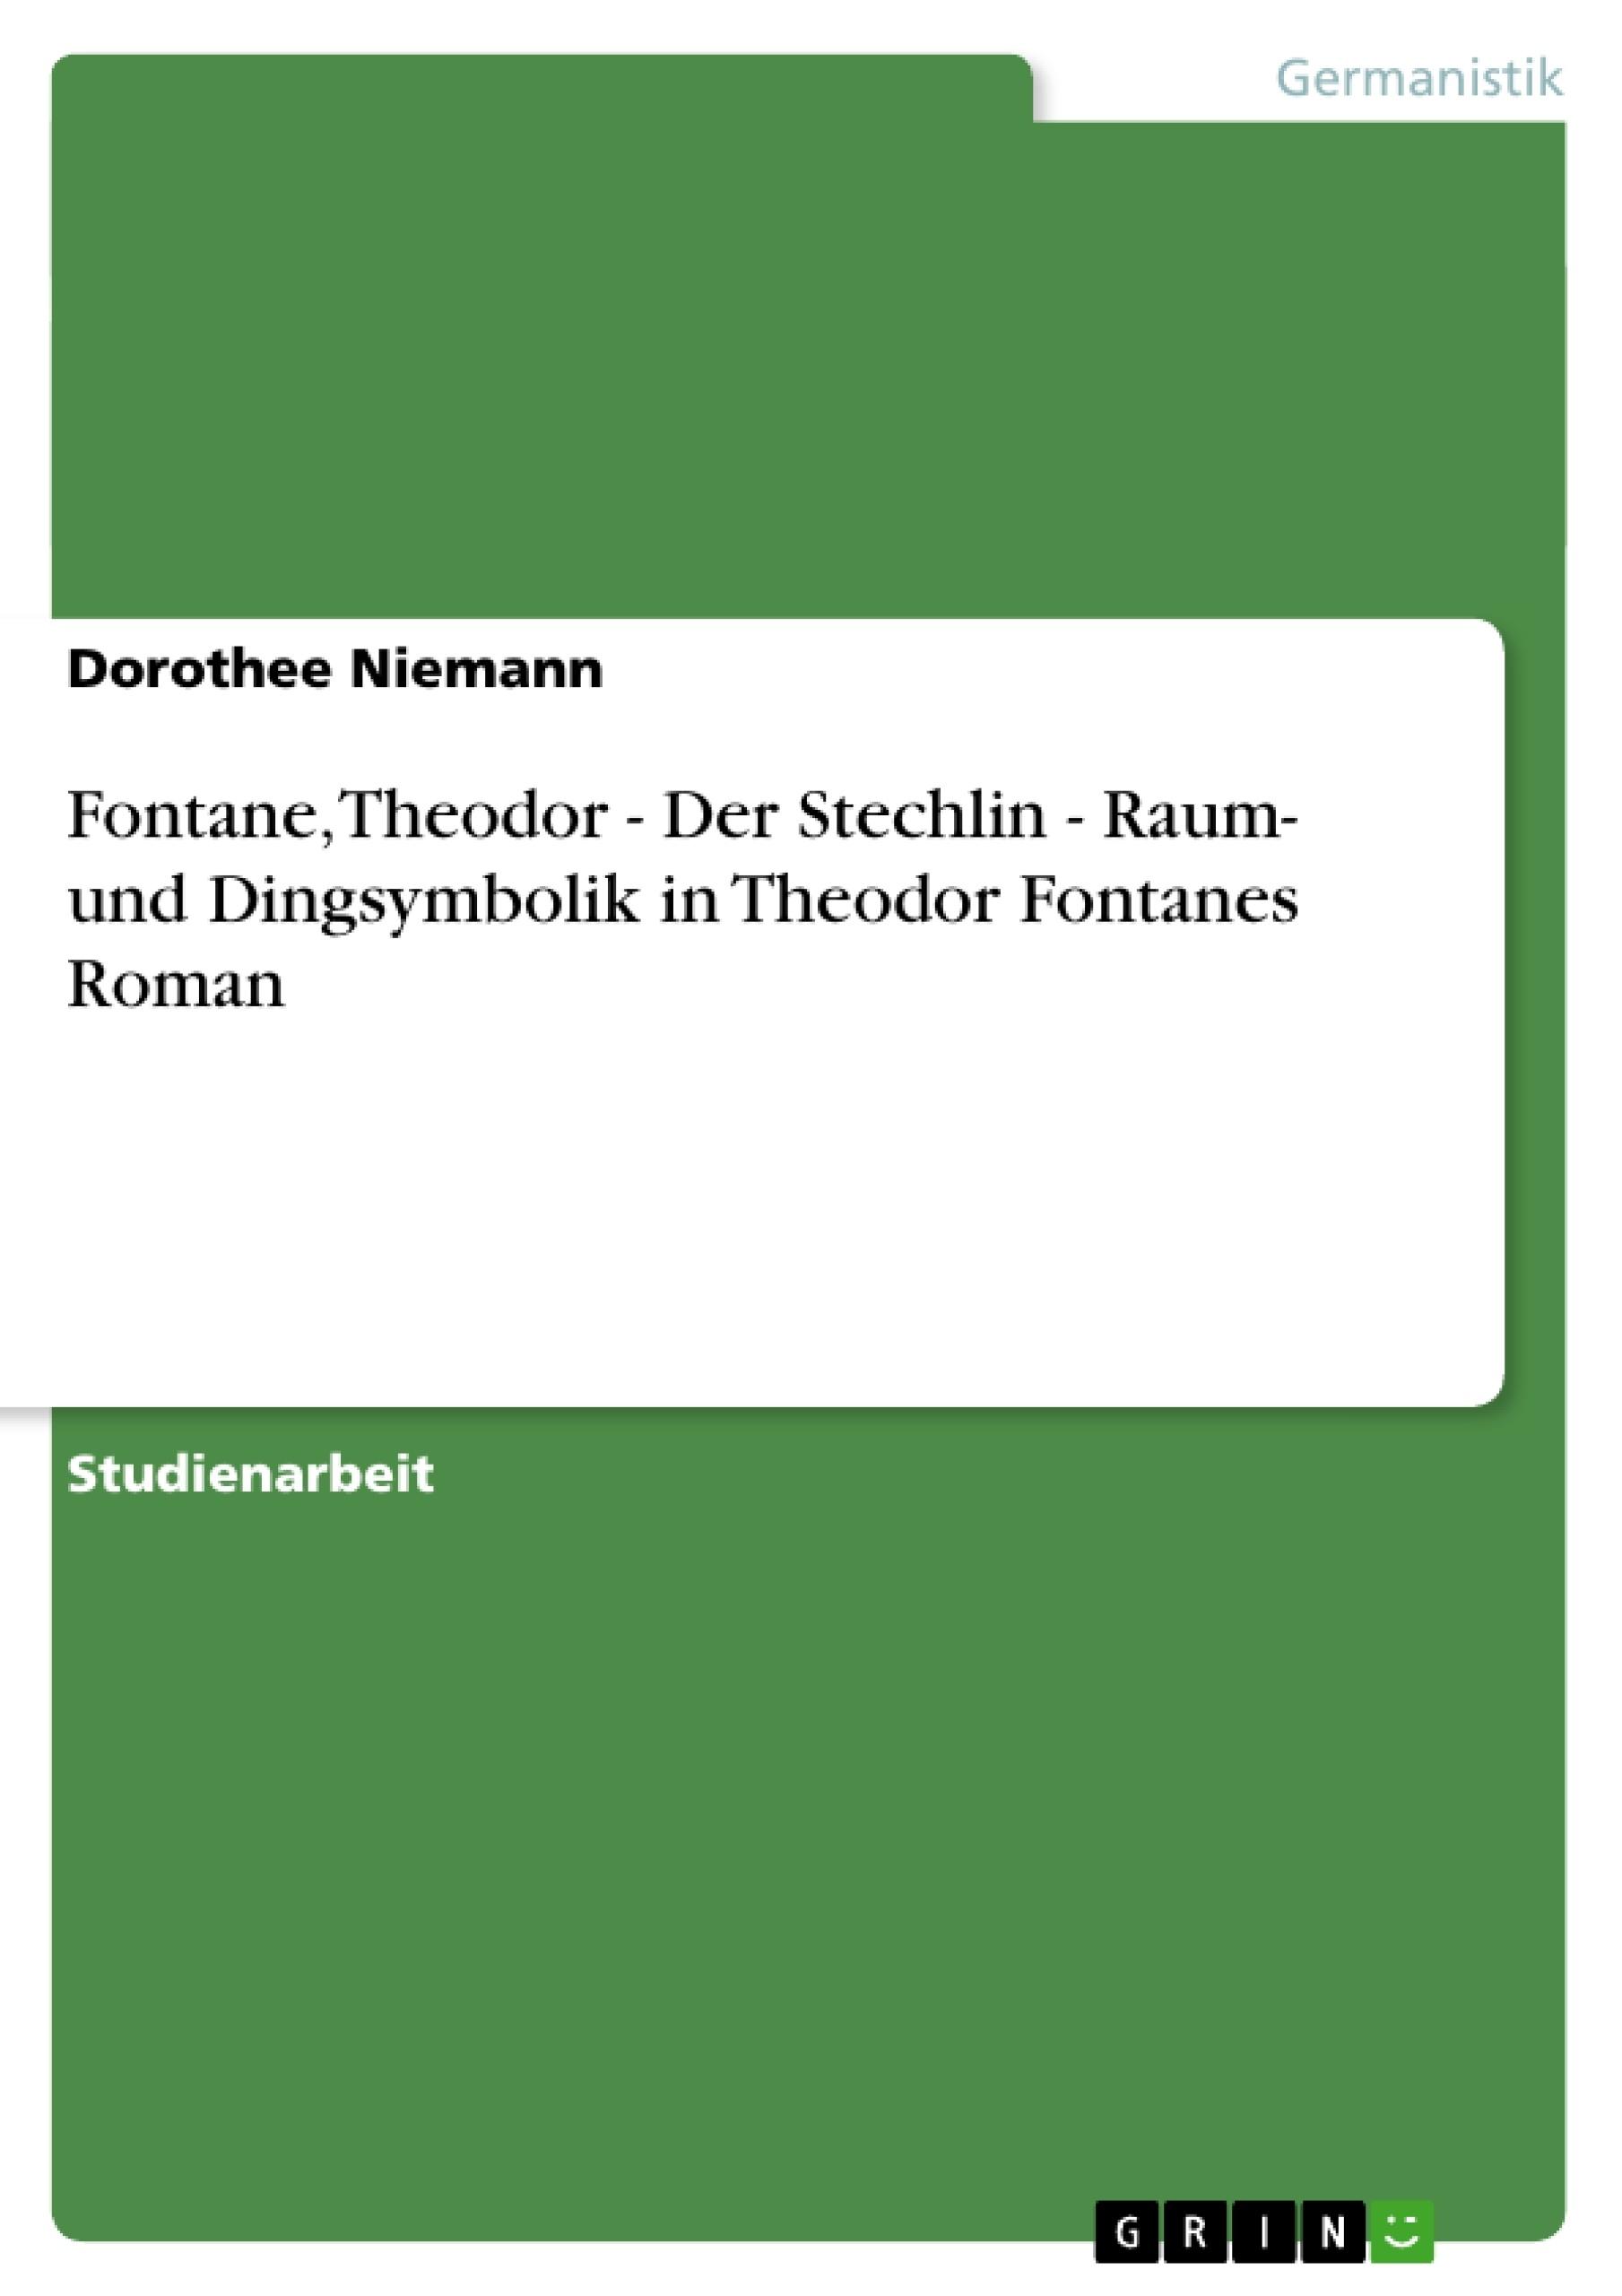 Titel: Fontane, Theodor - Der Stechlin - Raum- und Dingsymbolik in Theodor Fontanes Roman